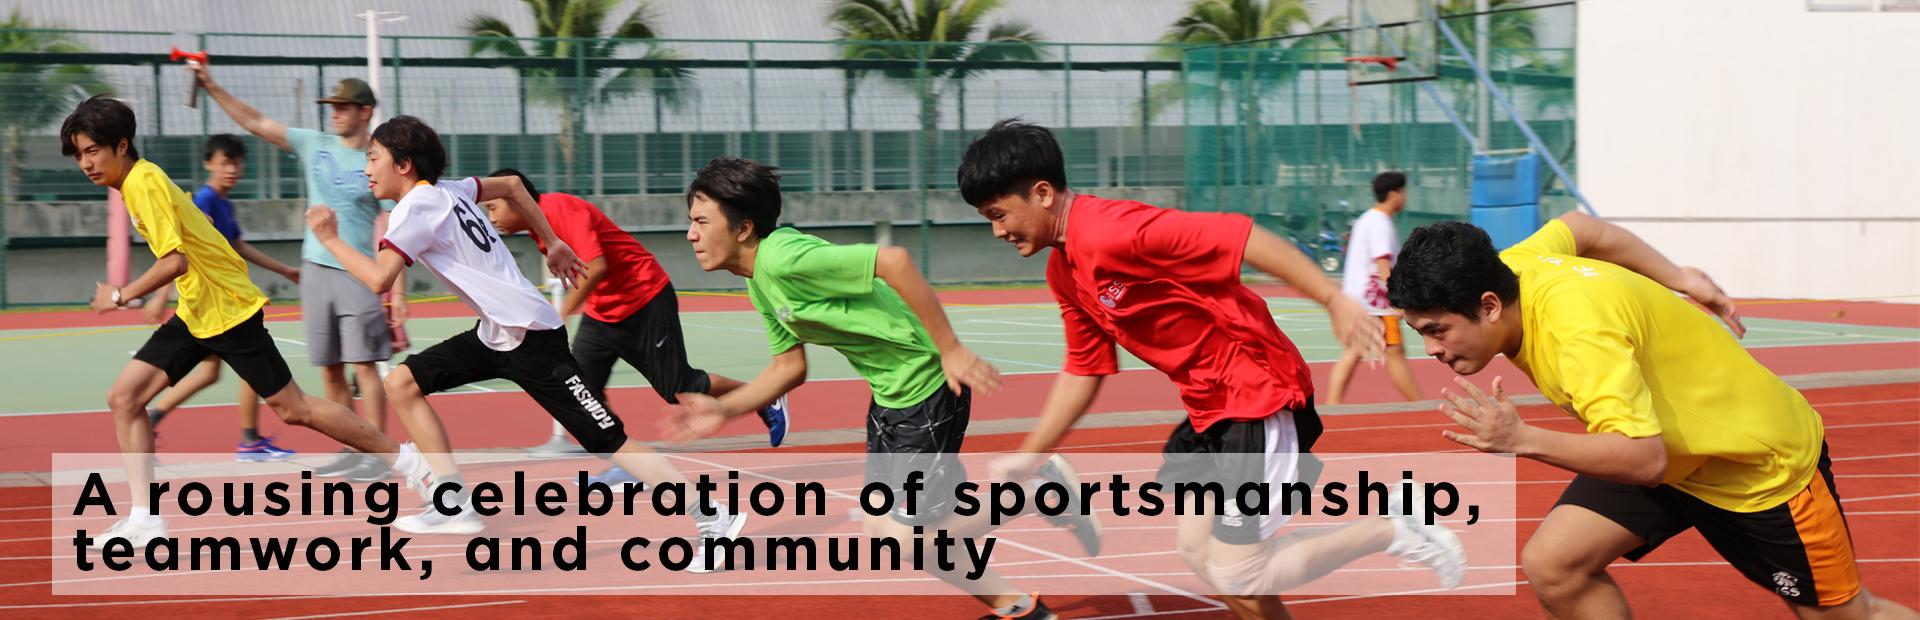 k-11-sports-day-banner